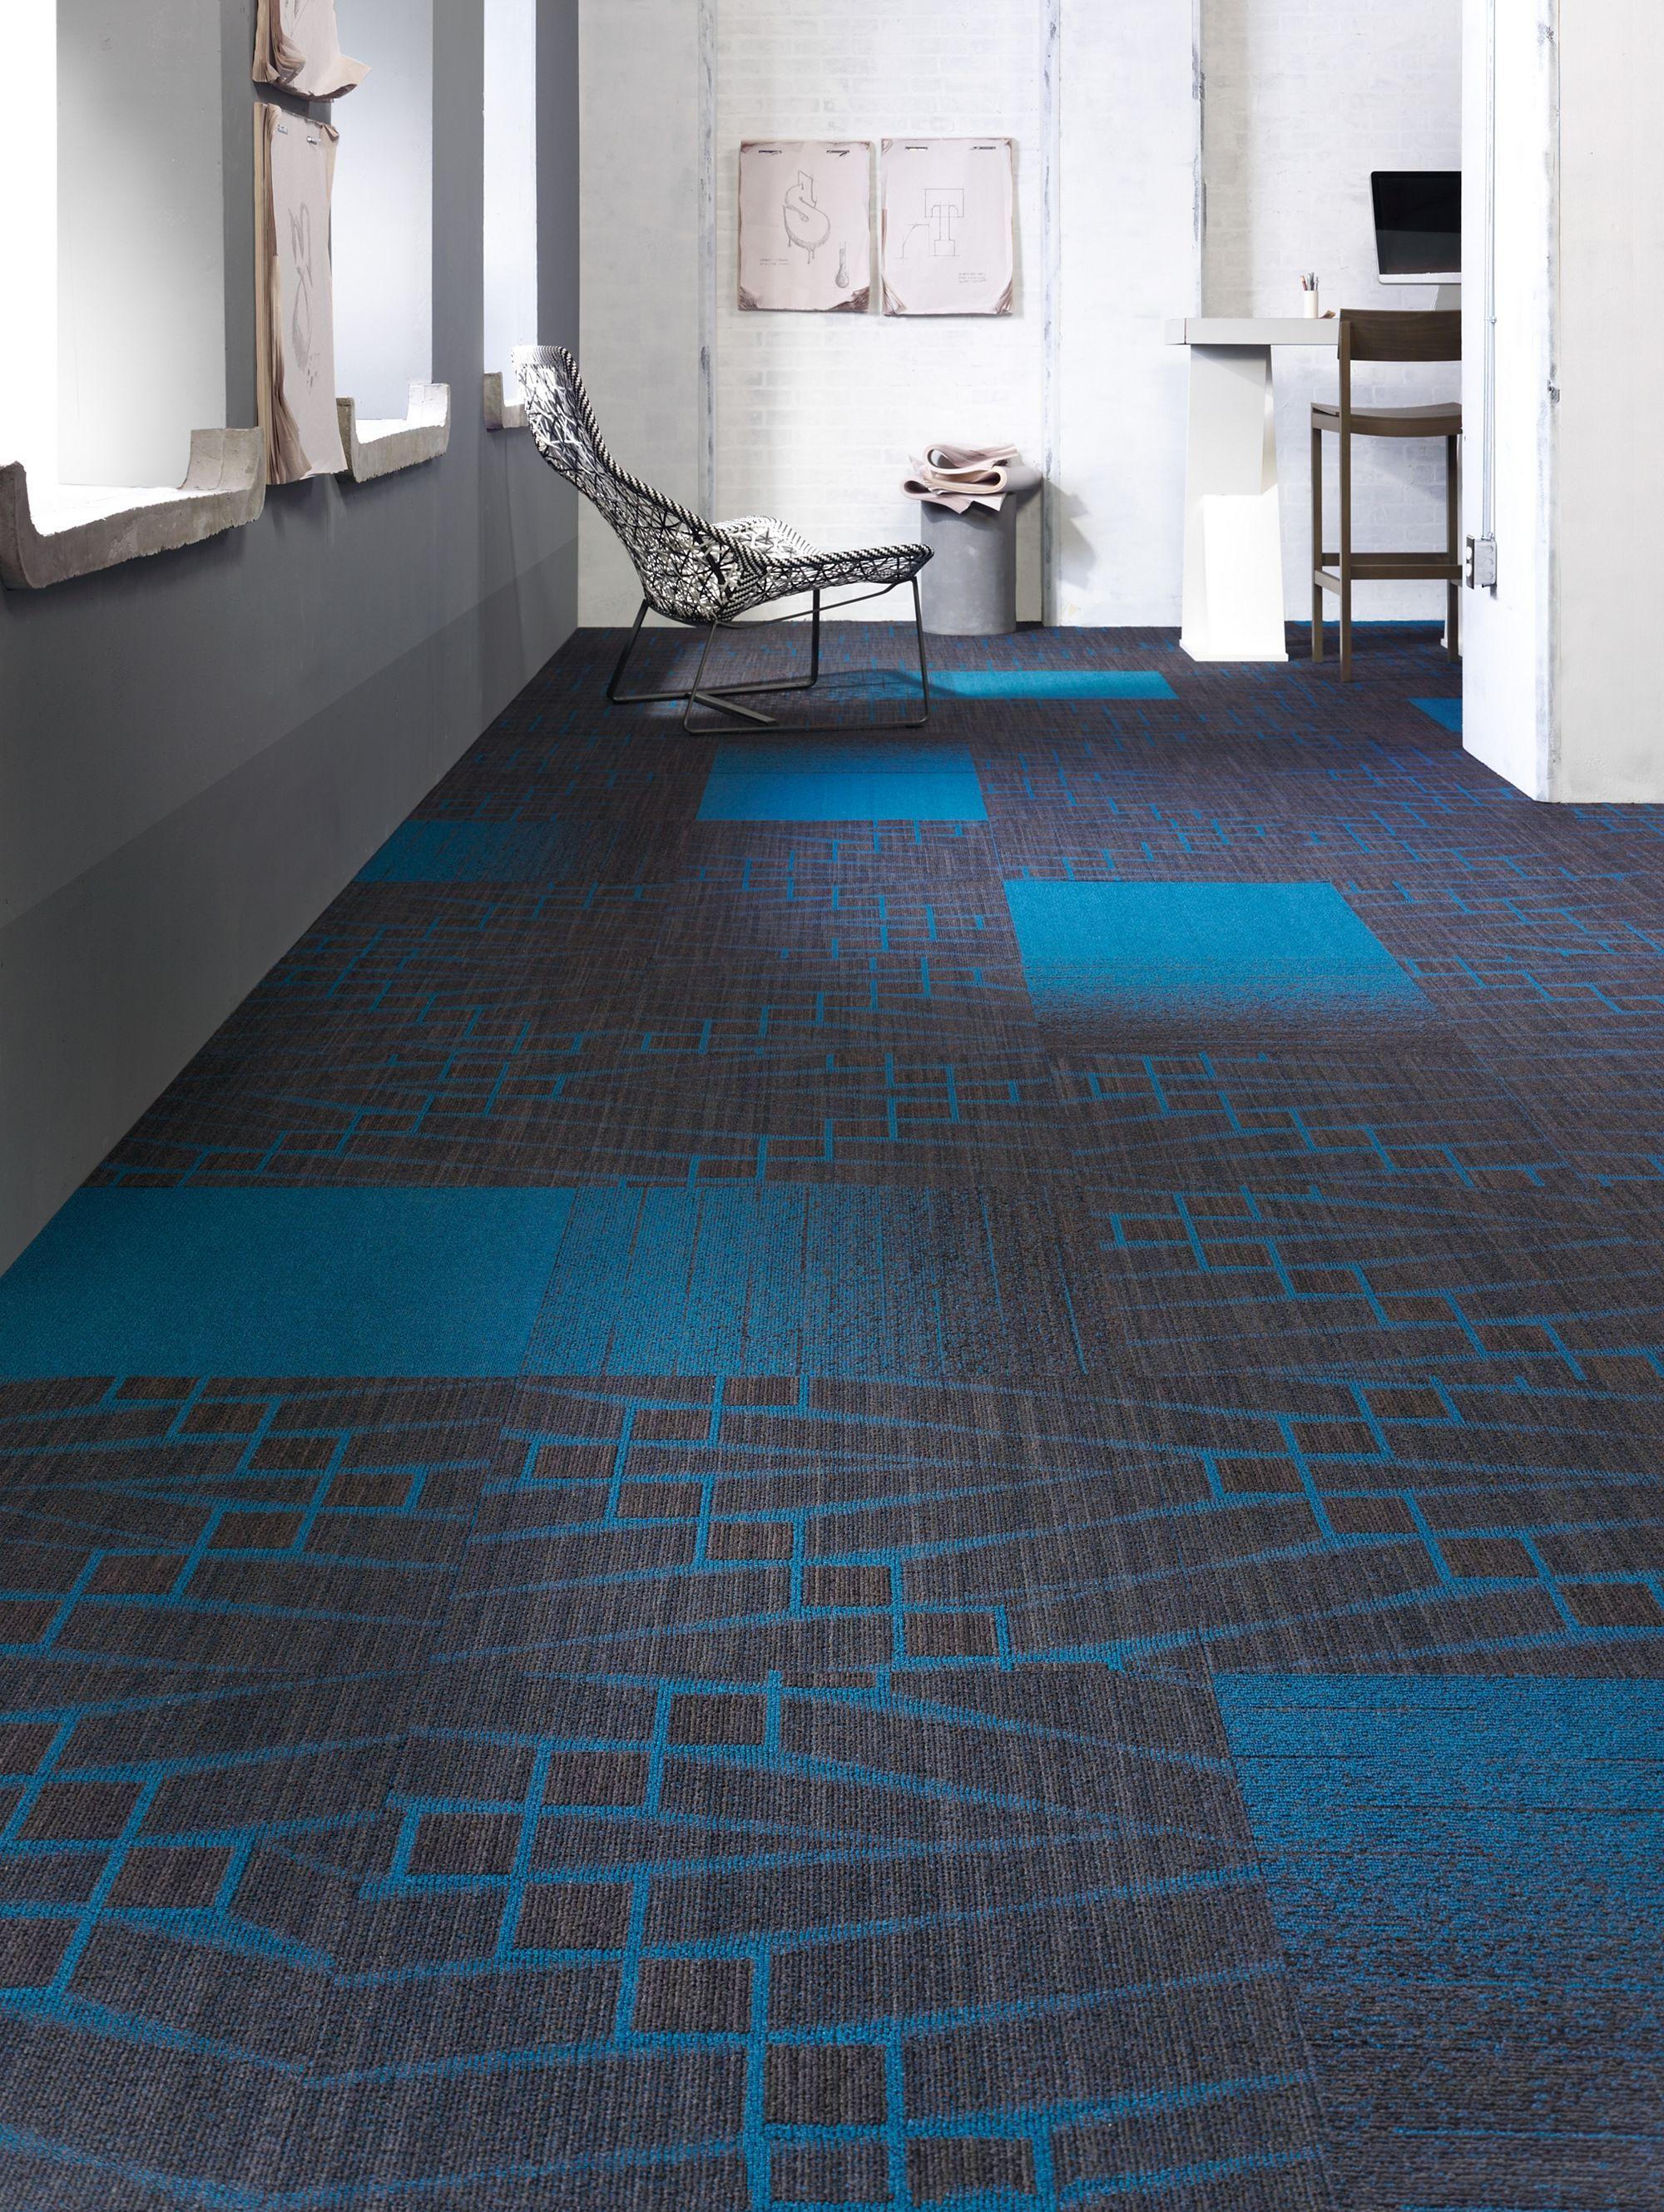 Carpet Tile Off The Wall Tile Cool Mohawk Group Wall Tiles Mohawk Group Carpet Tiles